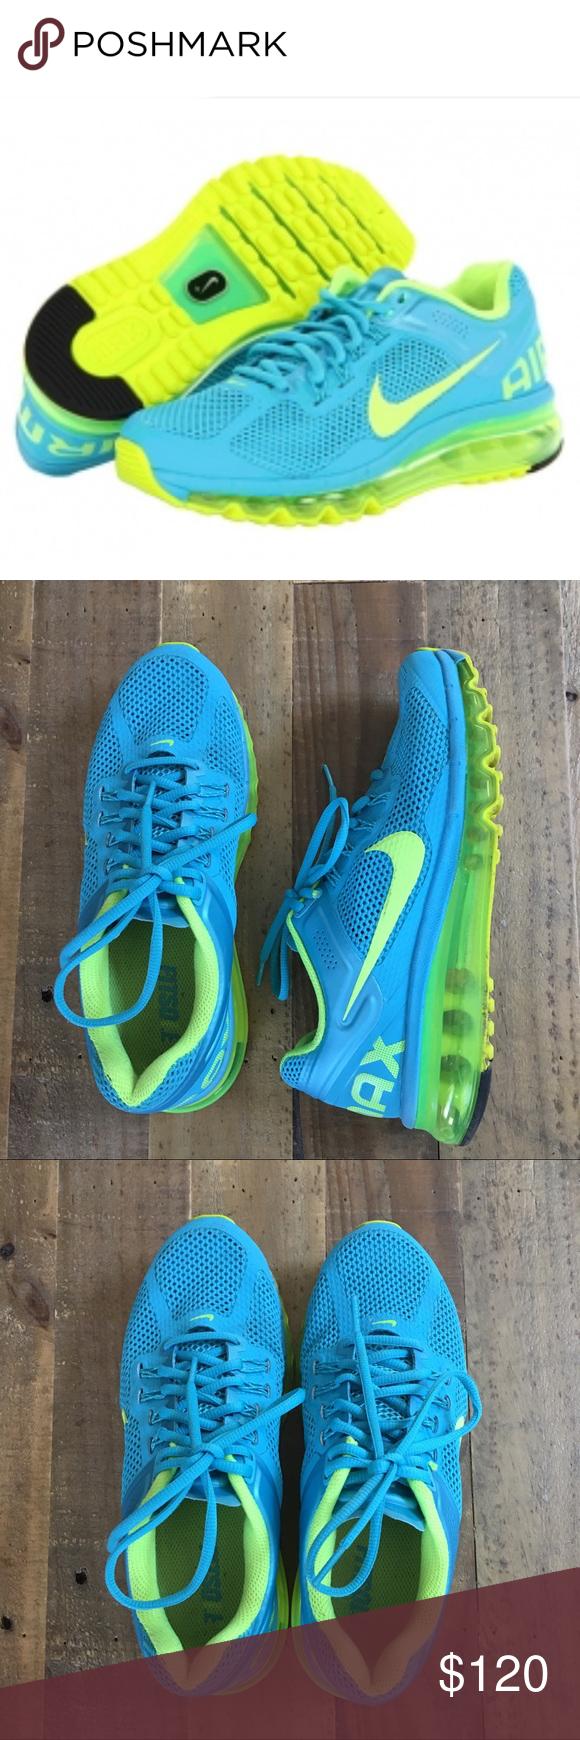 9fa438b6b308 ... Womens Nike Air Max 2013 Gamma Blue Volt Size 7.5 ...